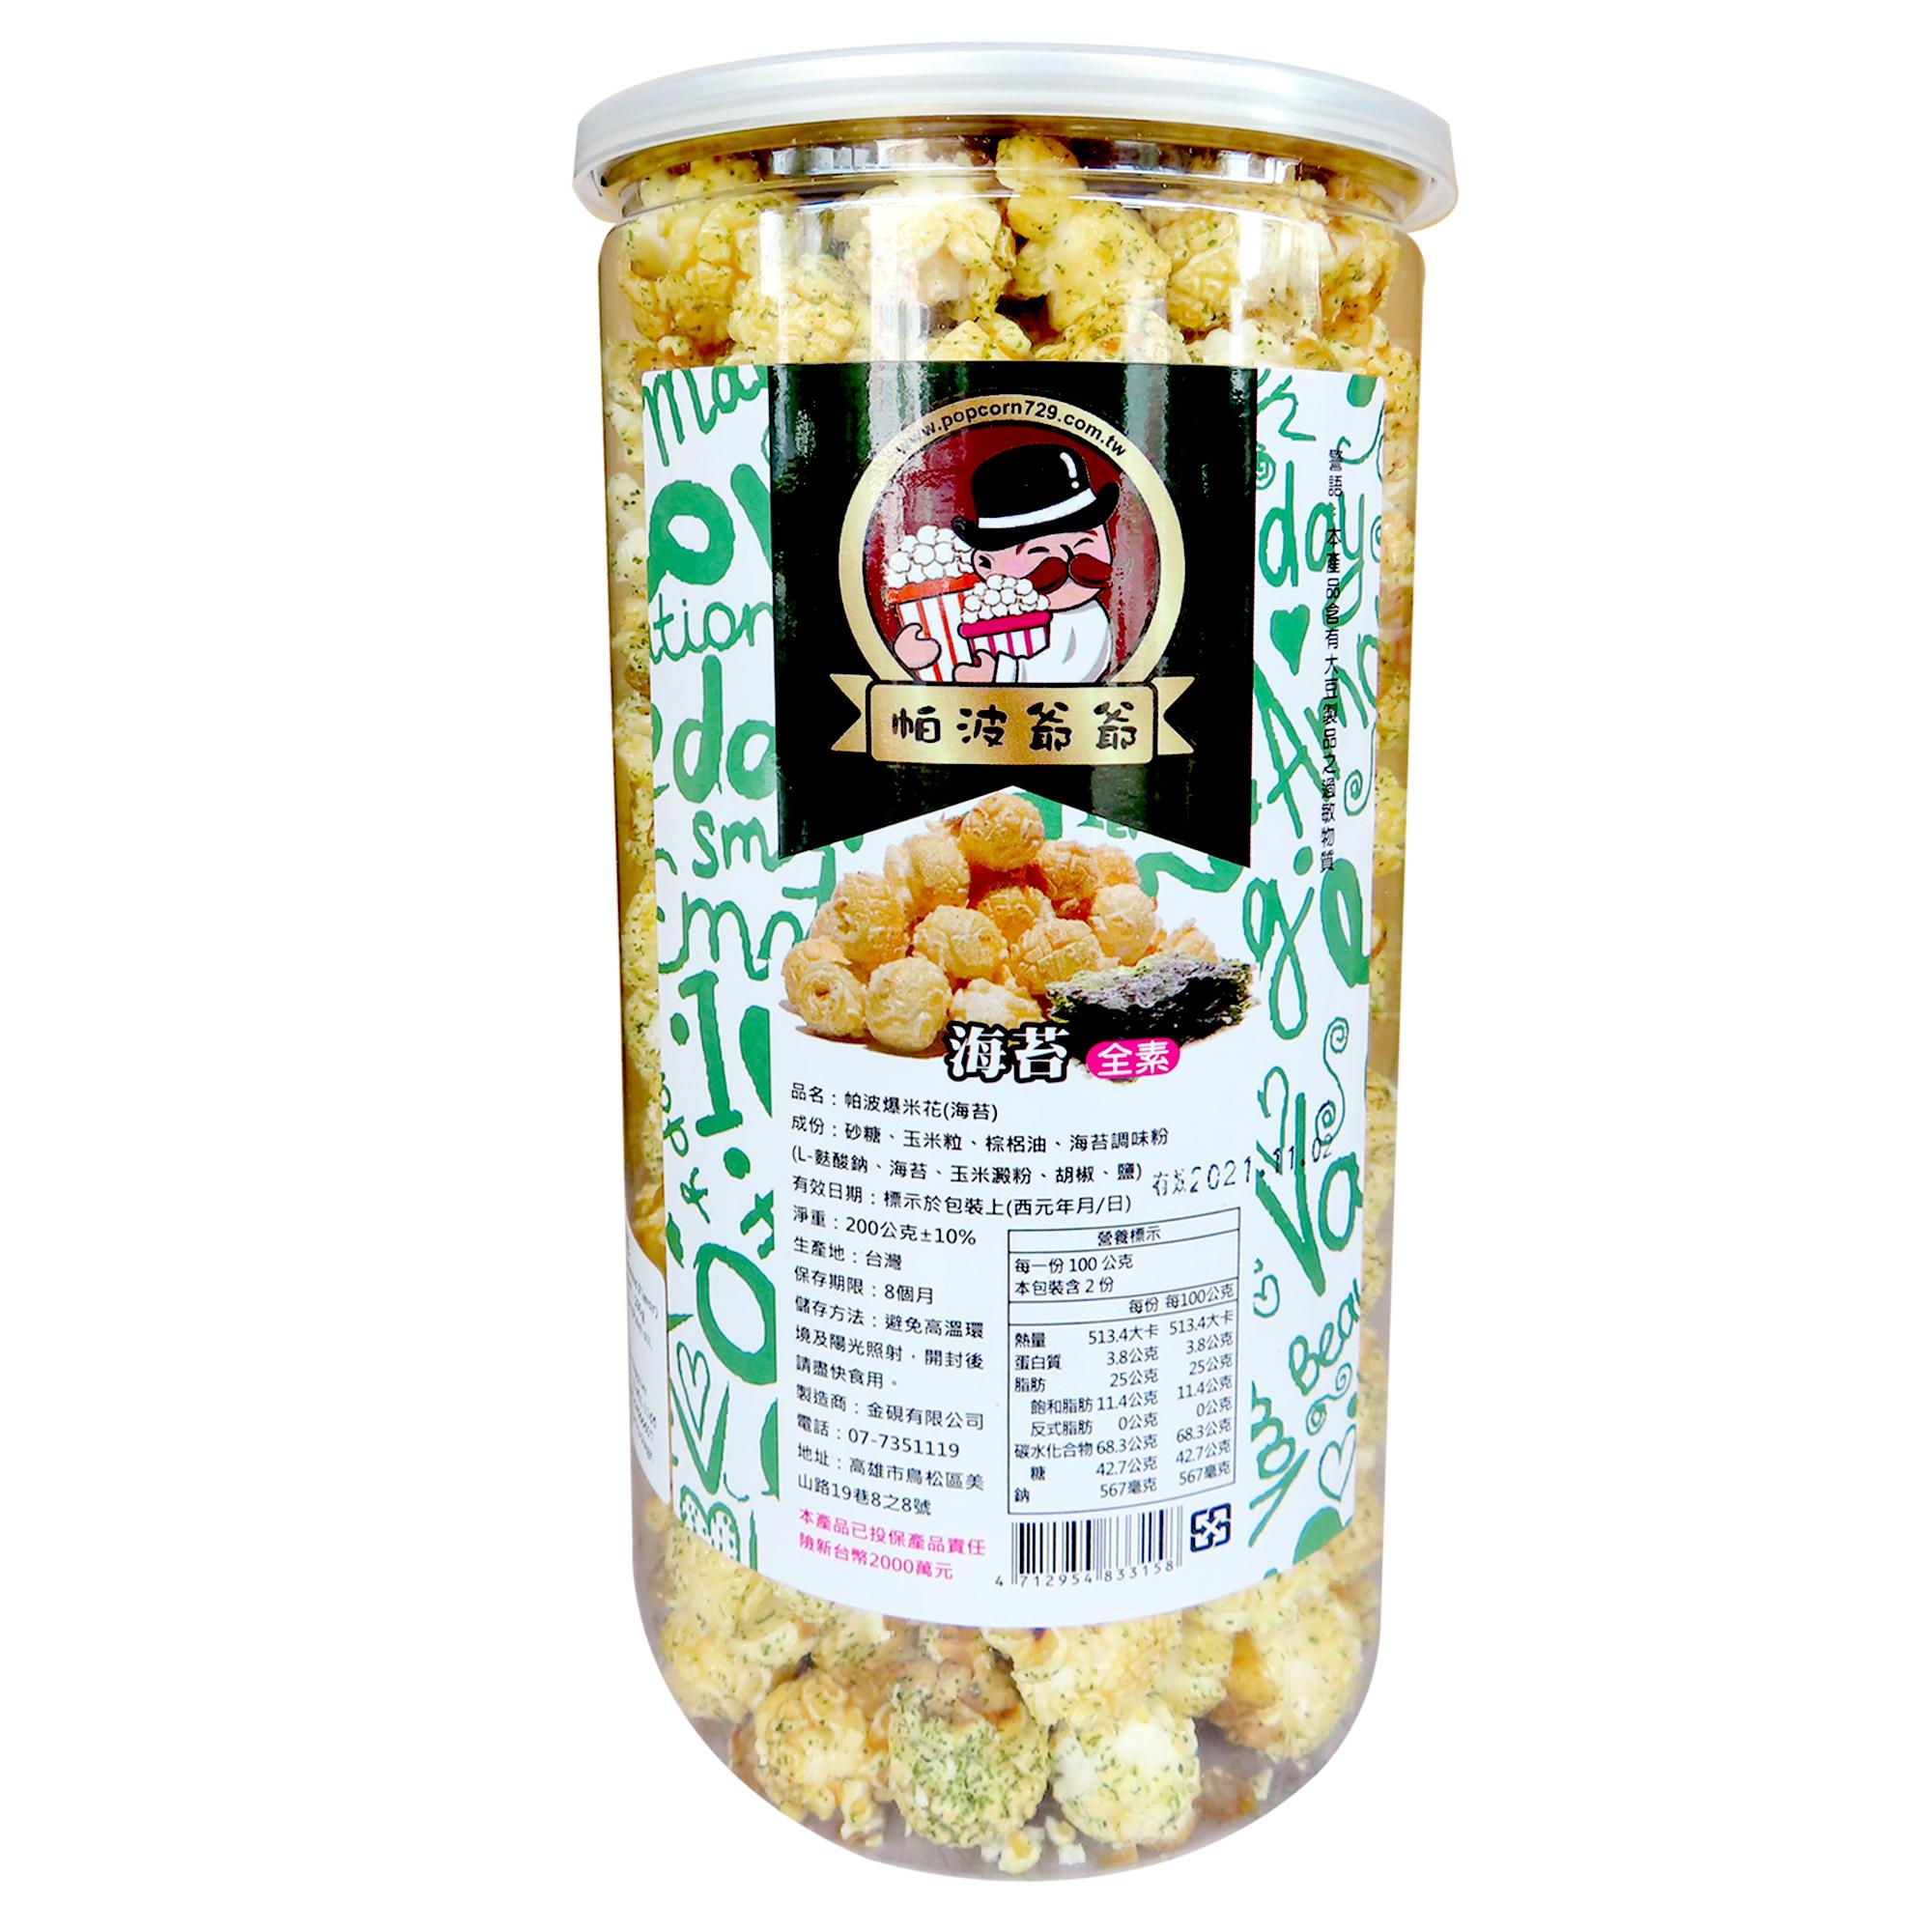 Image Papo Popcorn Seaweed 金砚-海苔爆米花 200grams